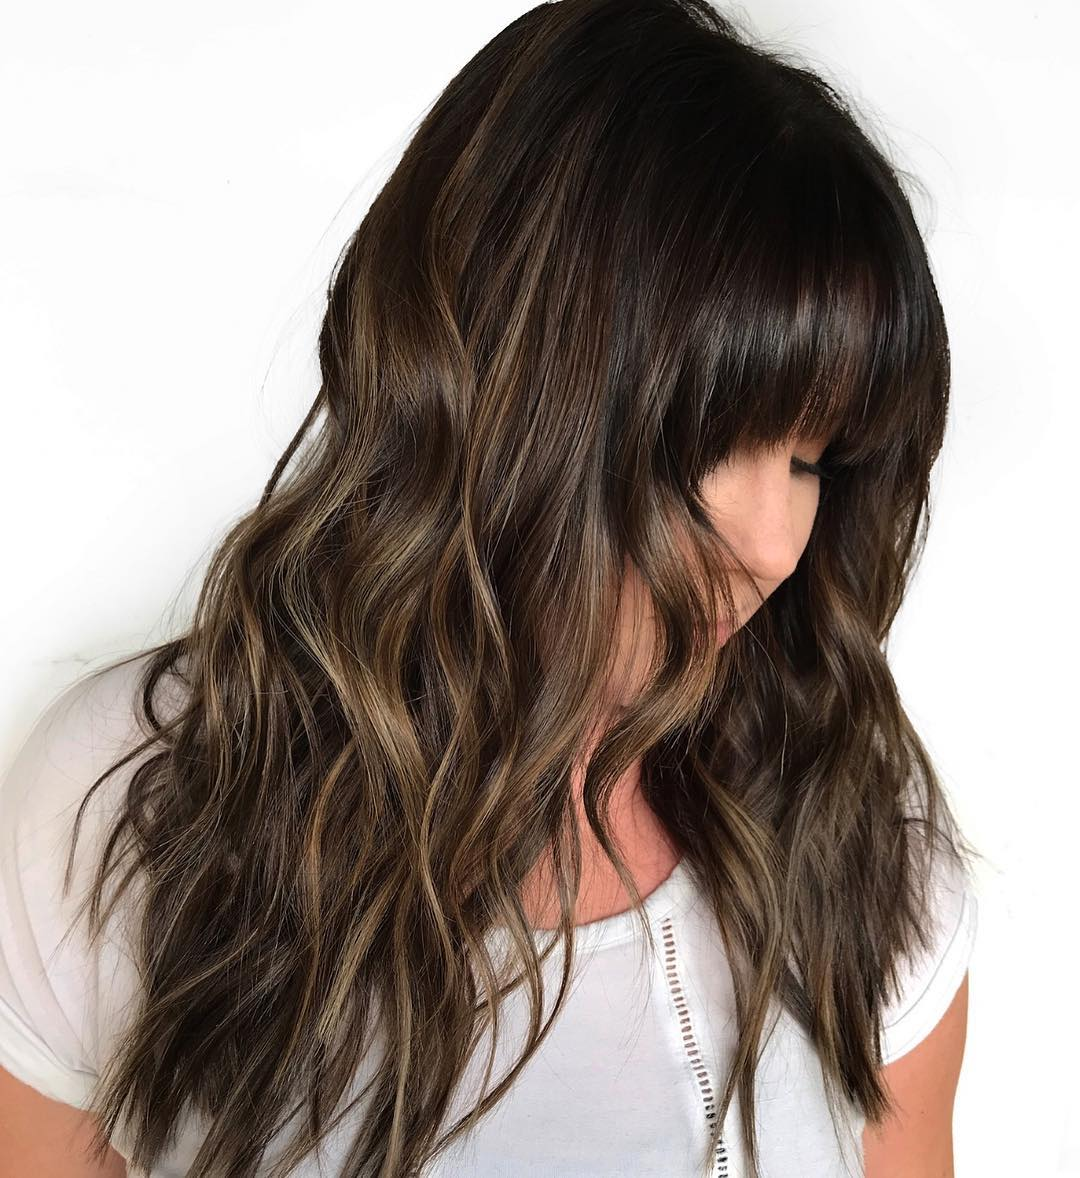 Long Wavy Haircut with Full Bangs